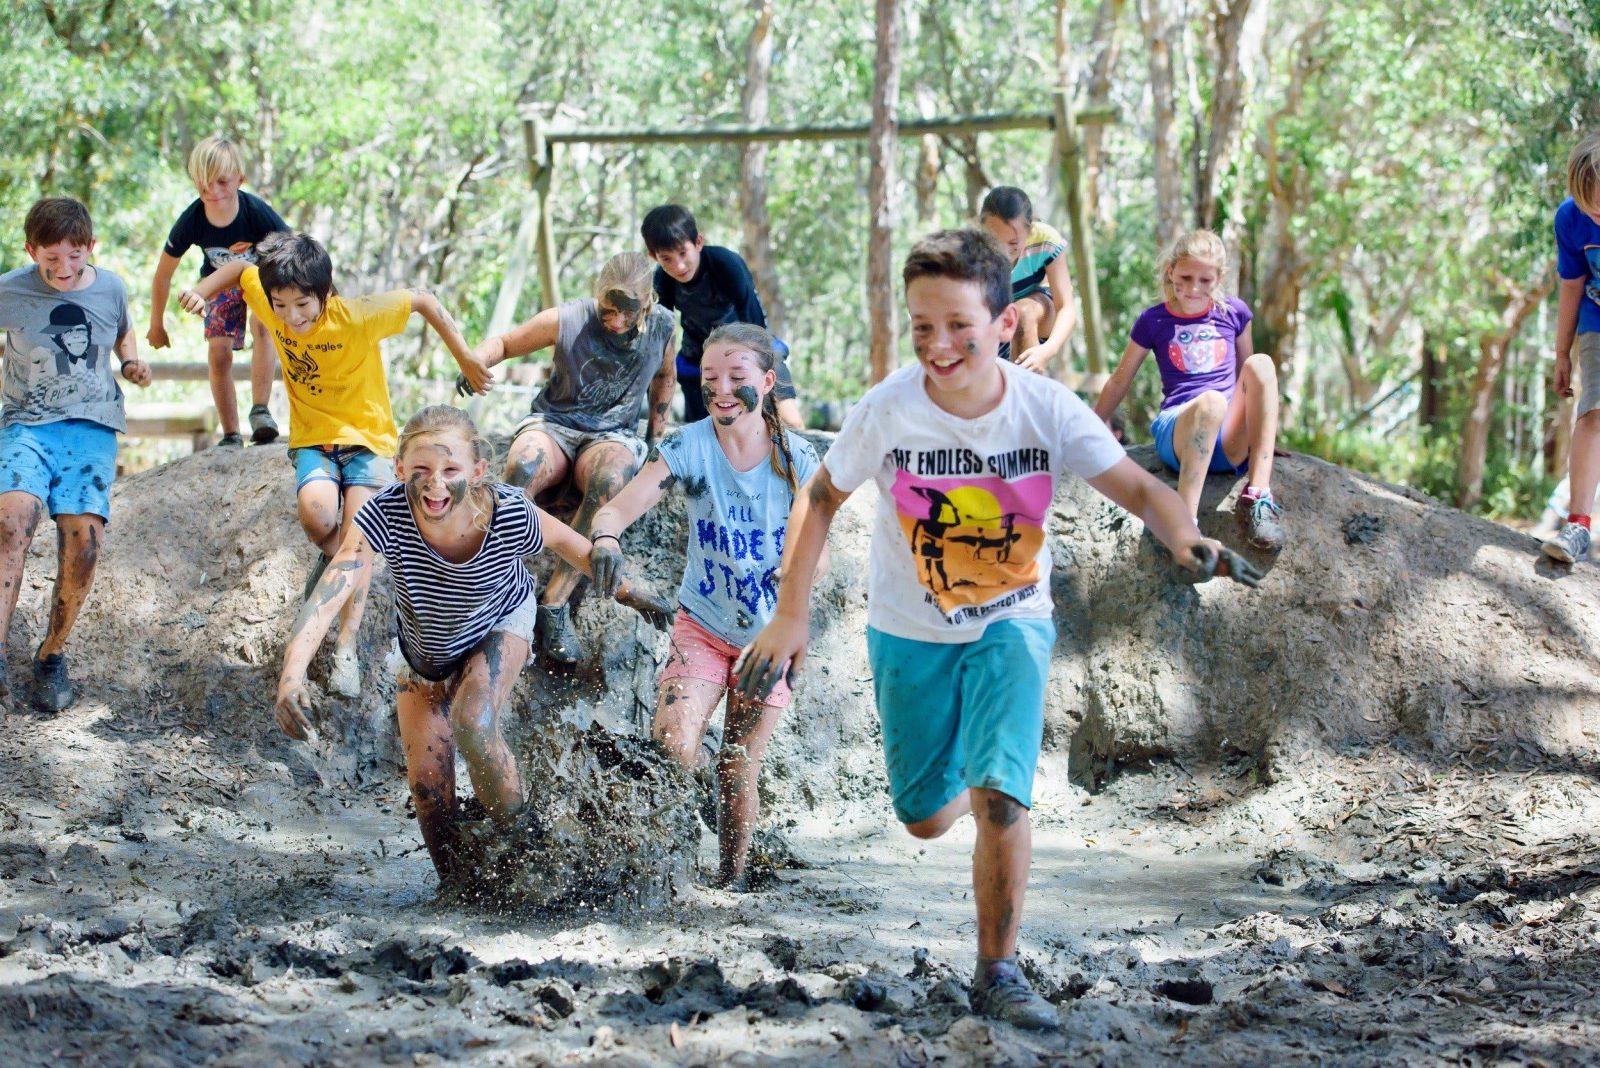 Mud Pit Challenge Course